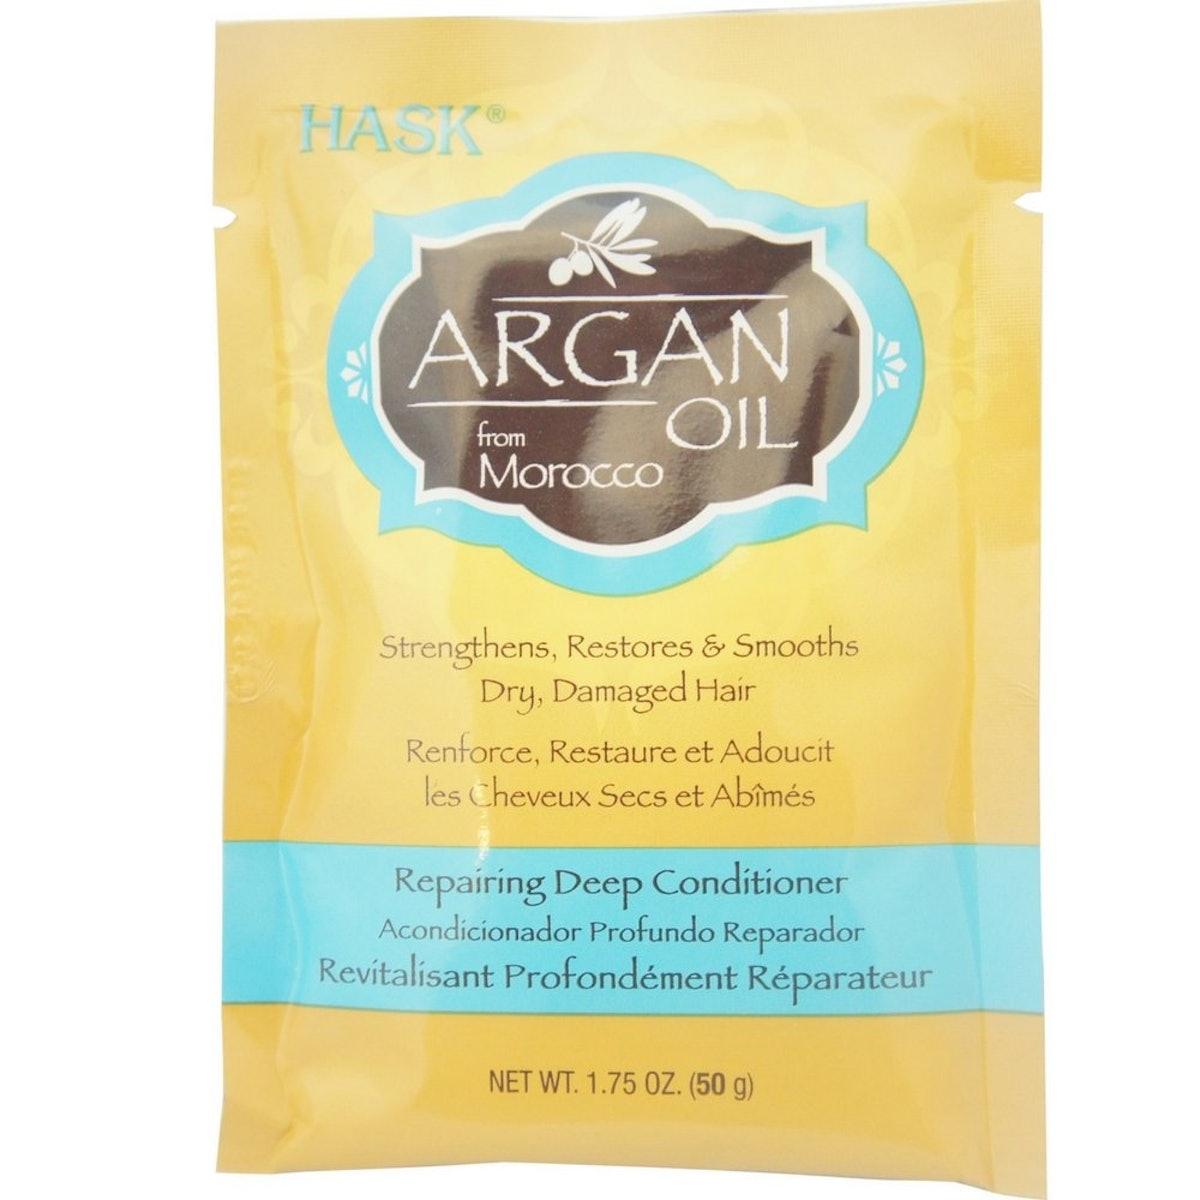 Hask Argan Oil Hair Treatment (4 Pack)